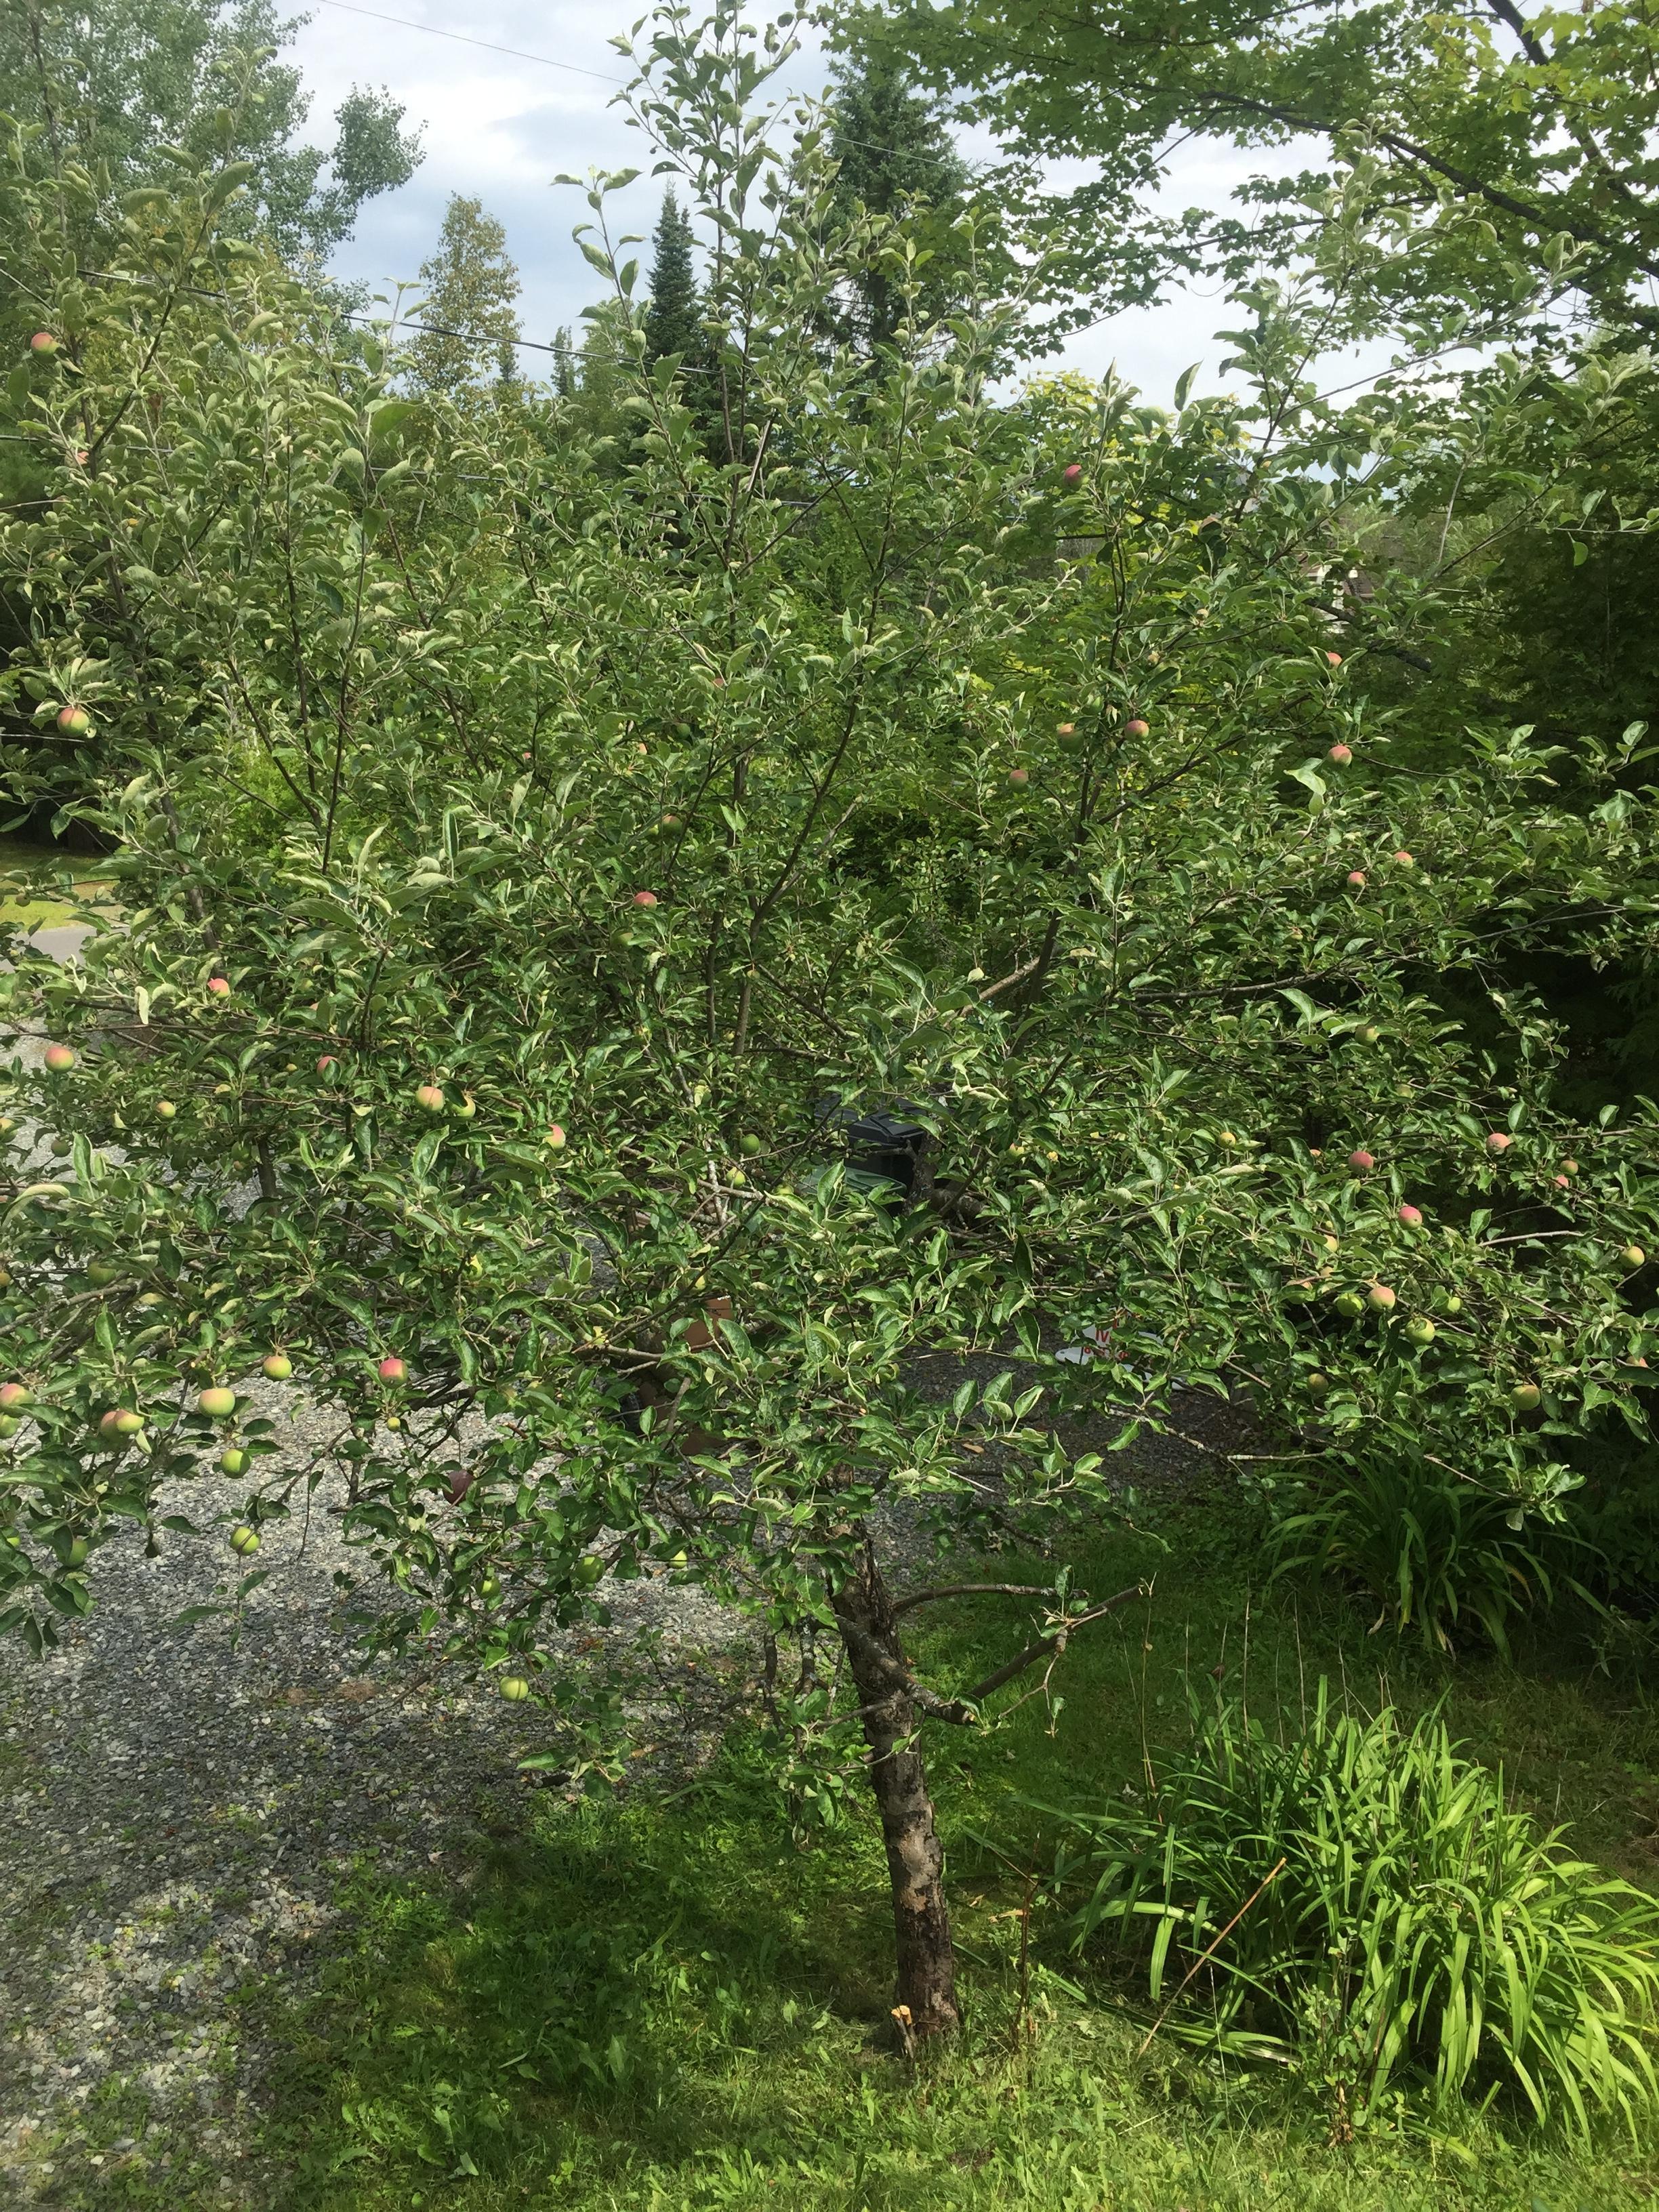 https://forum.jardiner-malin.fr/wp-content/uploads/sites/2/hm_bbpui/145951/ibel13na9zq0rajck6orvn4ux9p6wtwp.jpeg